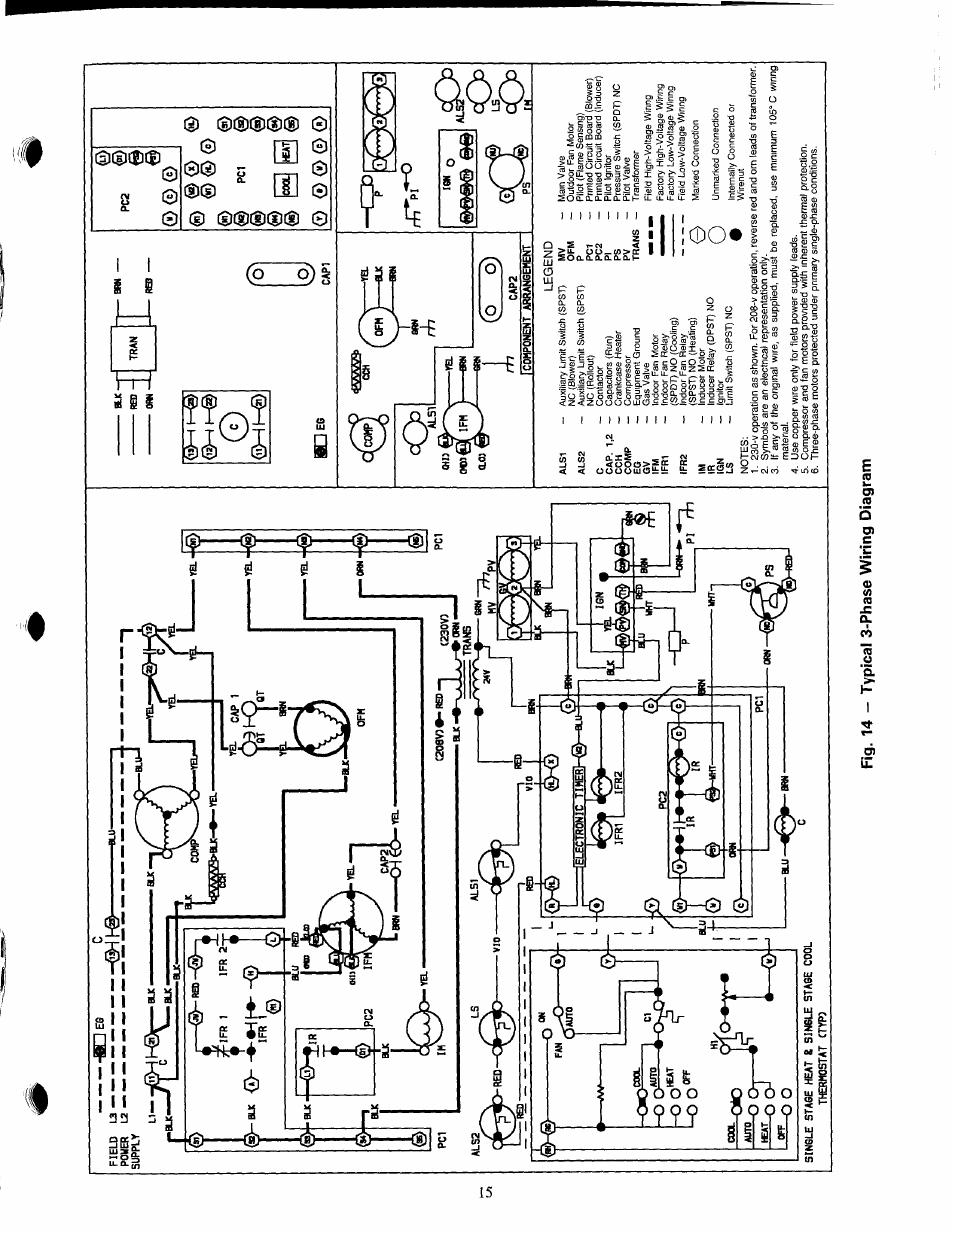 2006 mazda mpv van wiring diagrams